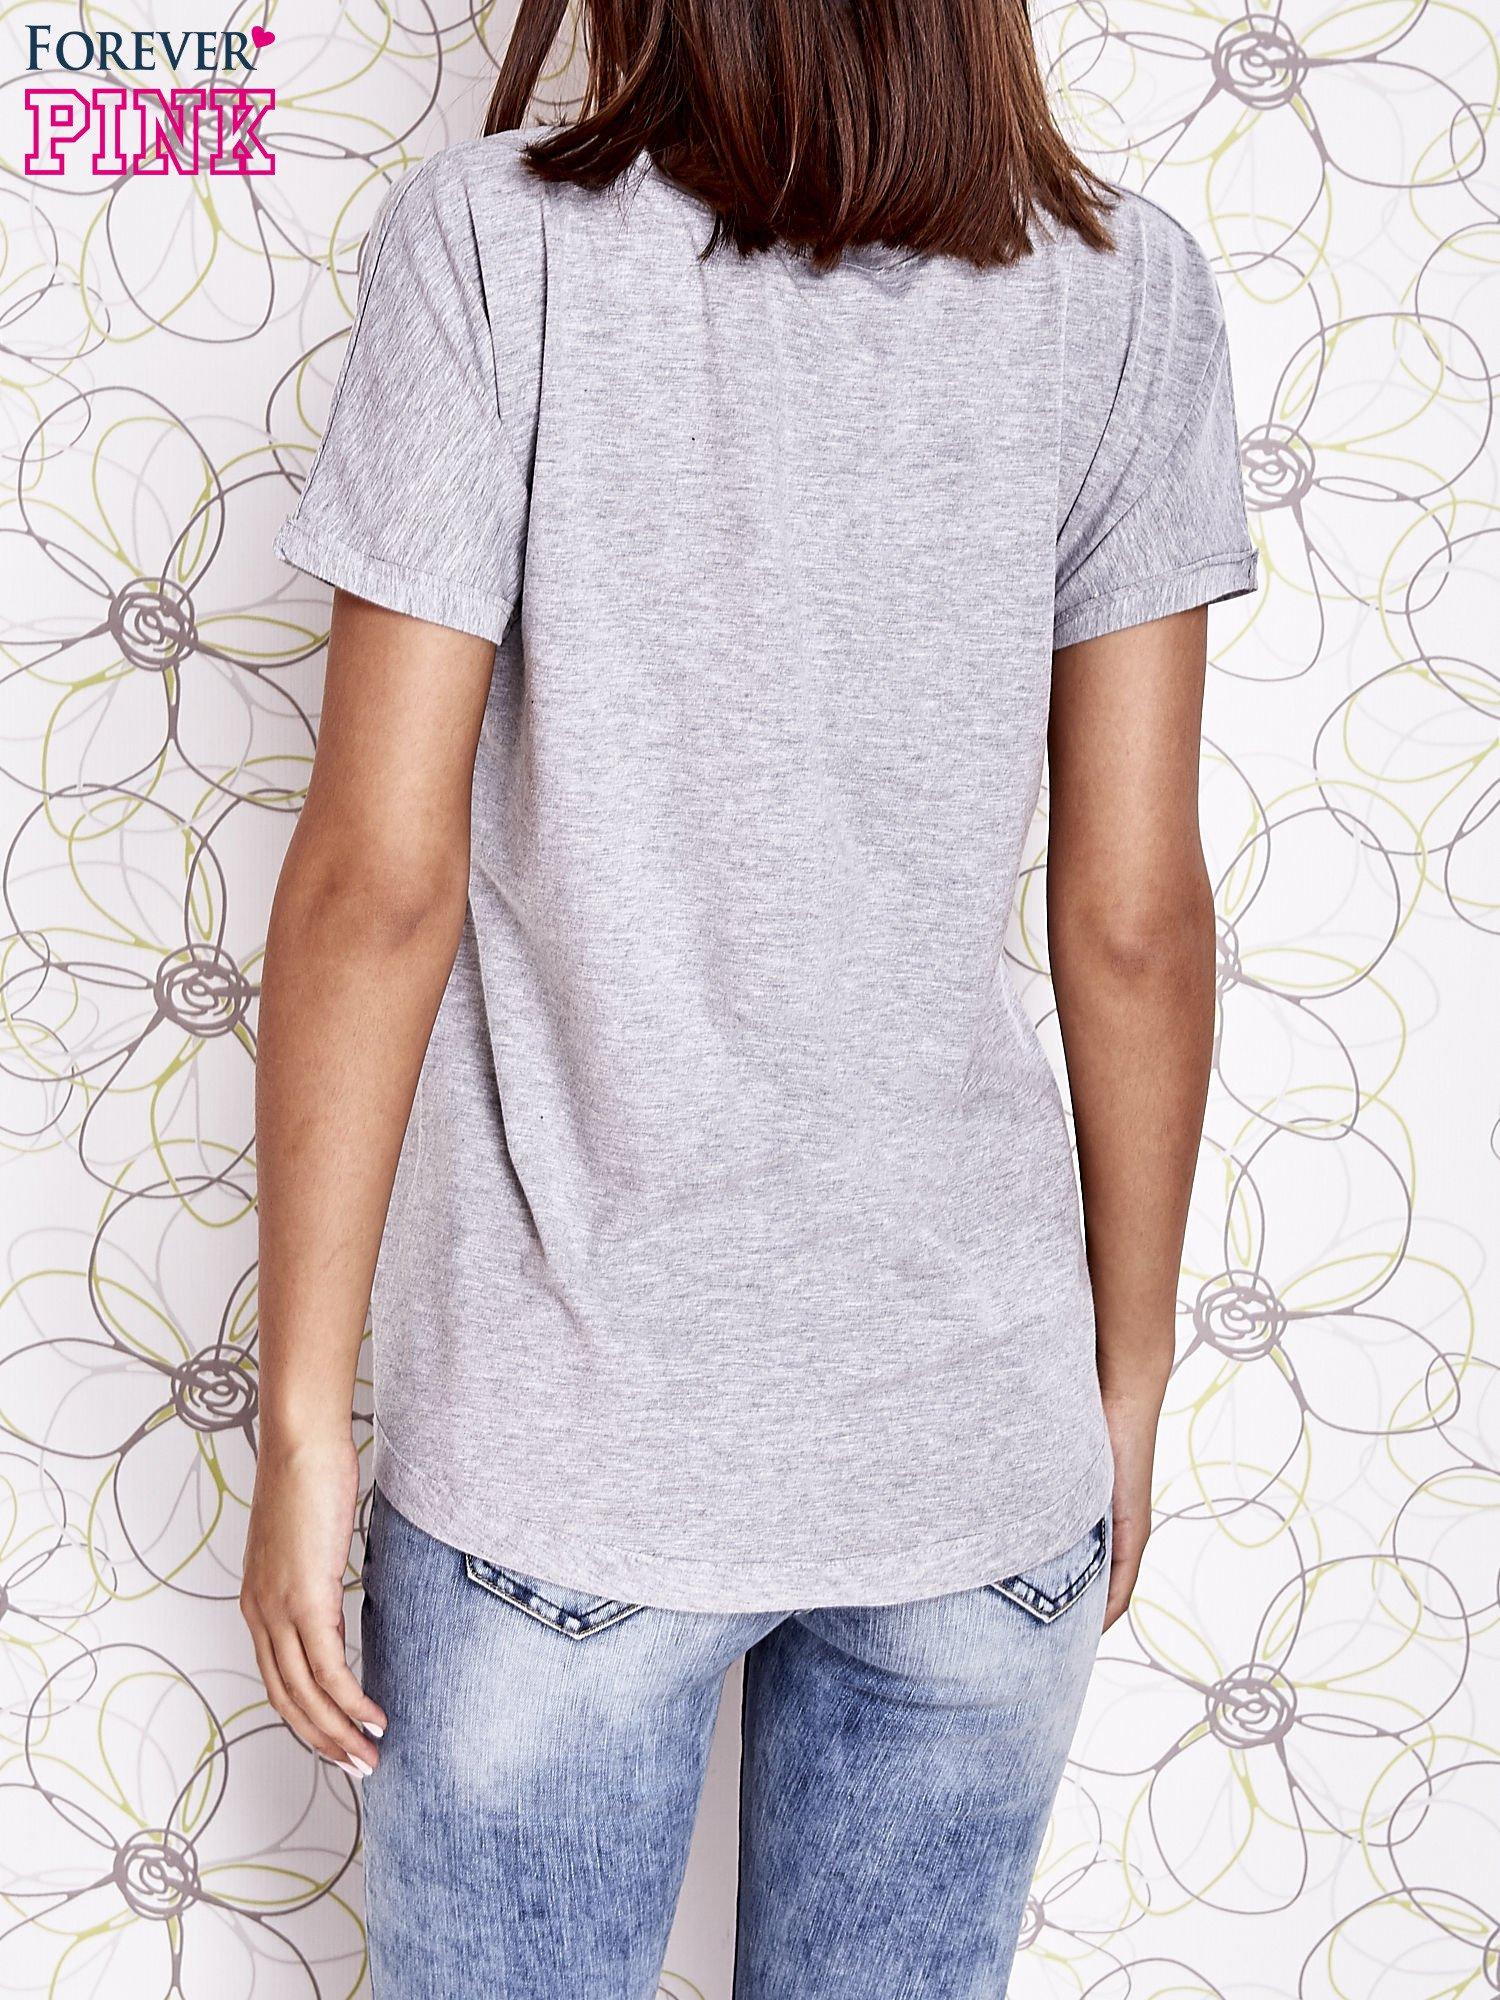 Szary t-shirt z motywem serca i kokardki                                  zdj.                                  4